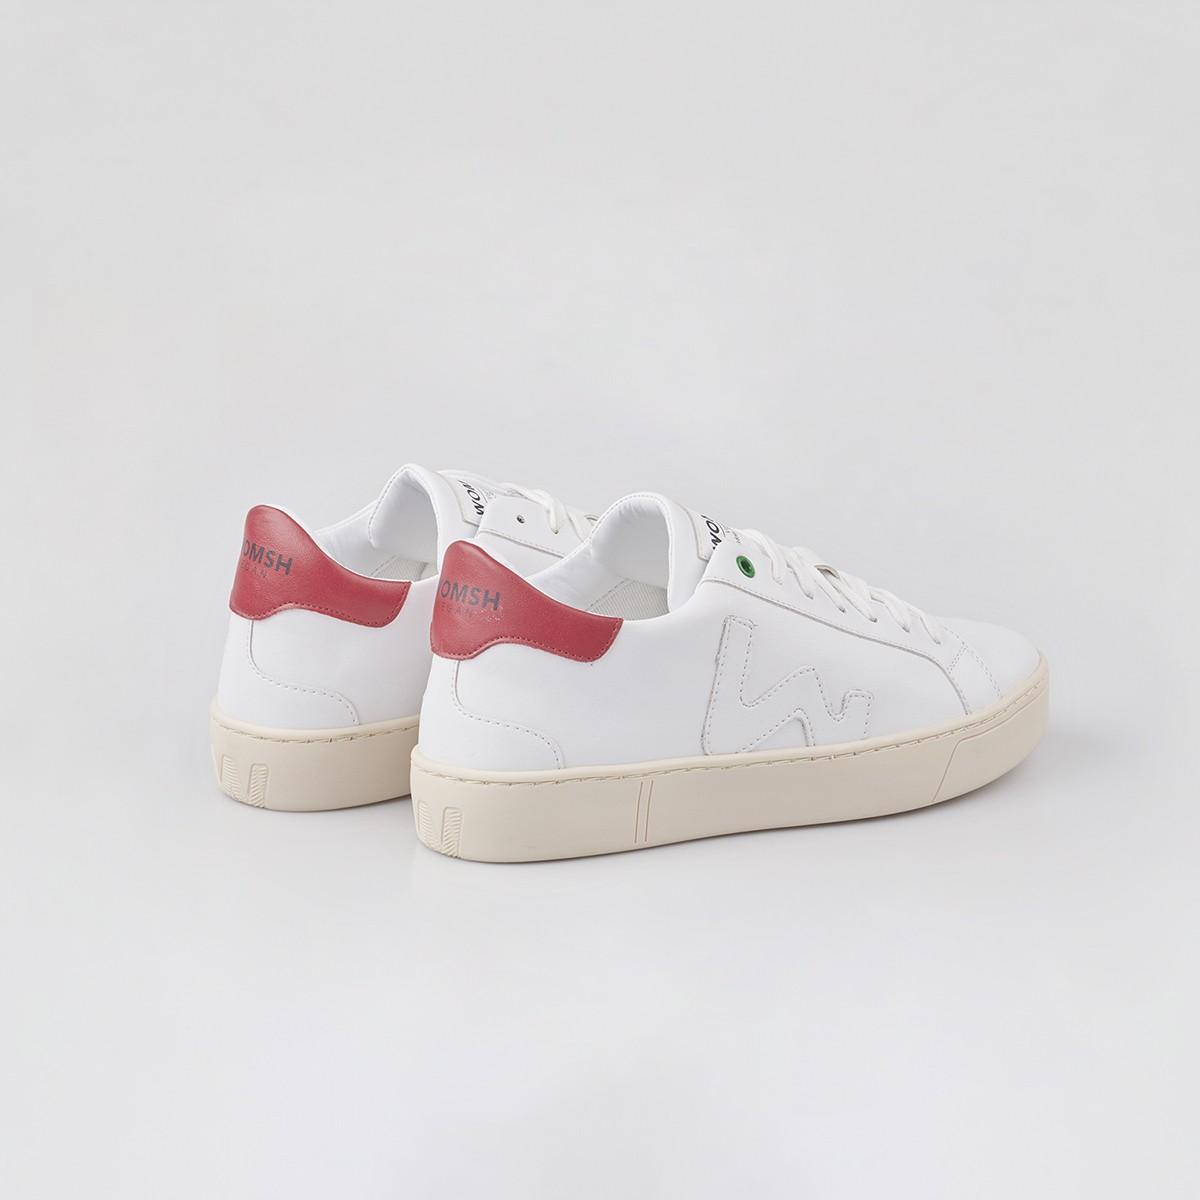 Womsh VEGAN SNIK WHITE RED / UNISEX